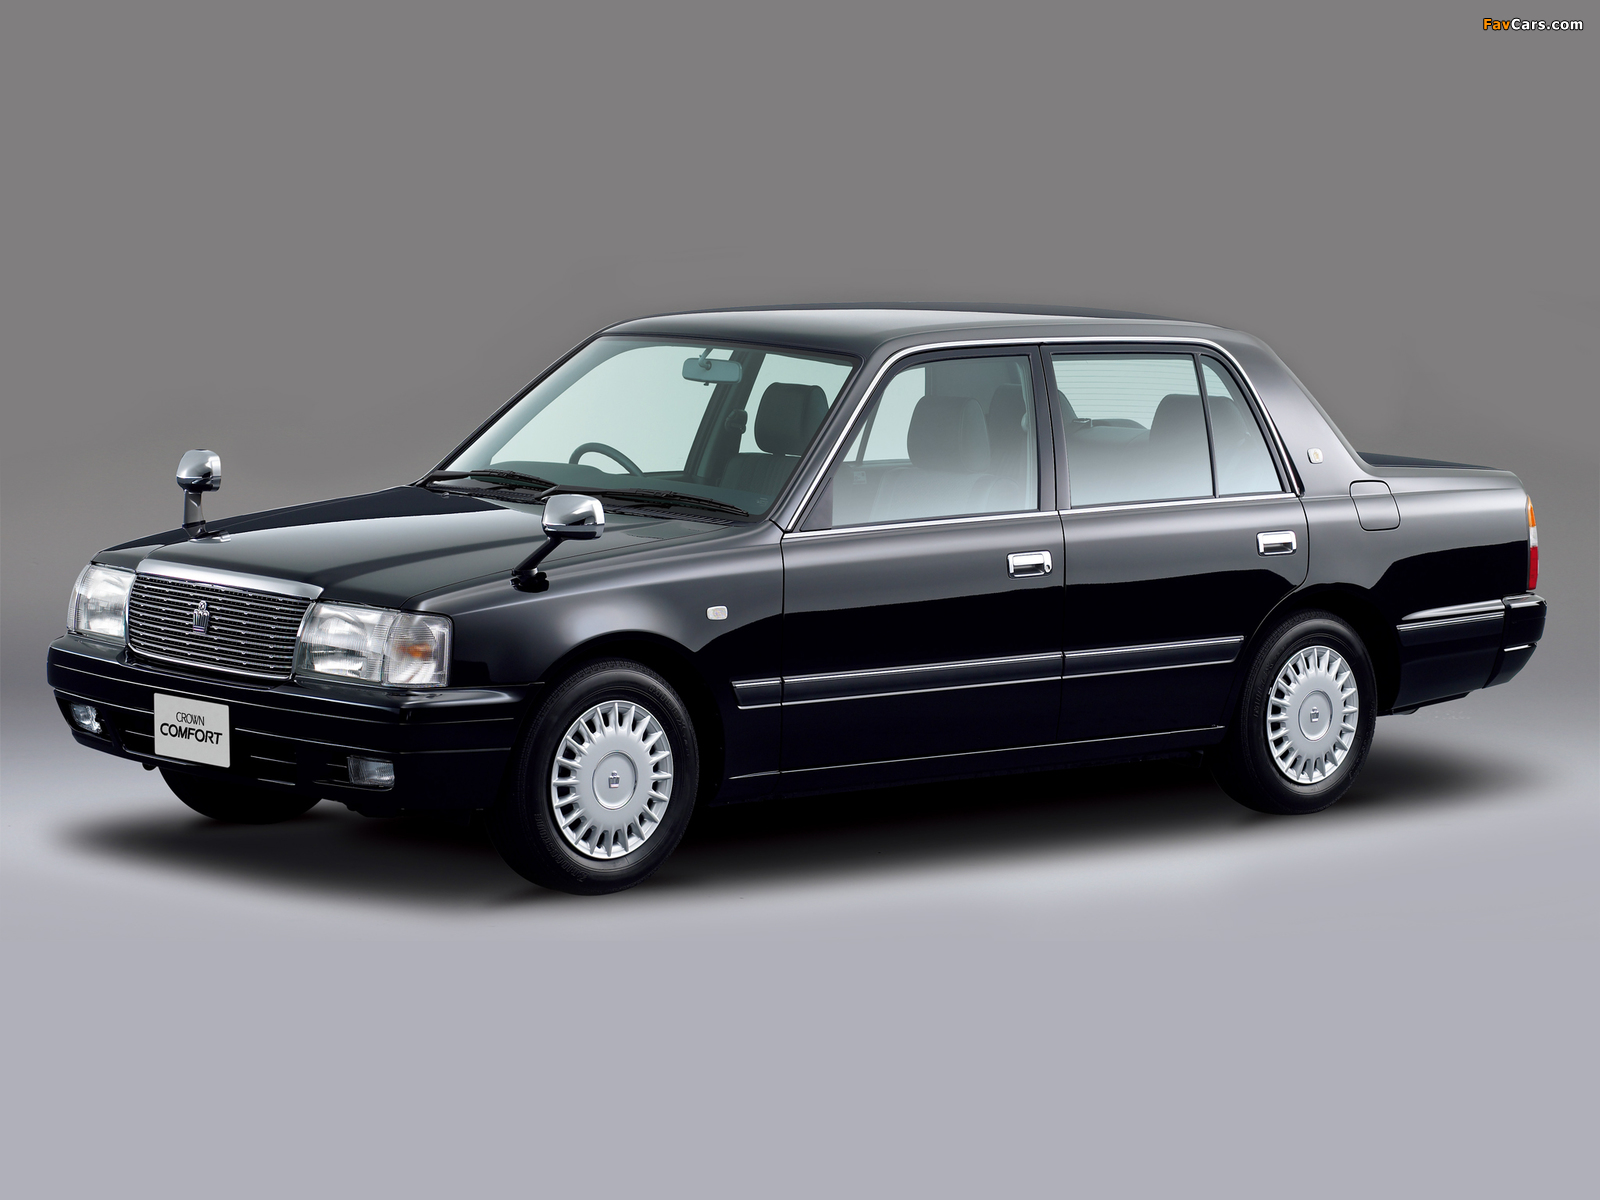 Toyota Crown Comfort (S10) 1995 photos (1600 x 1200)